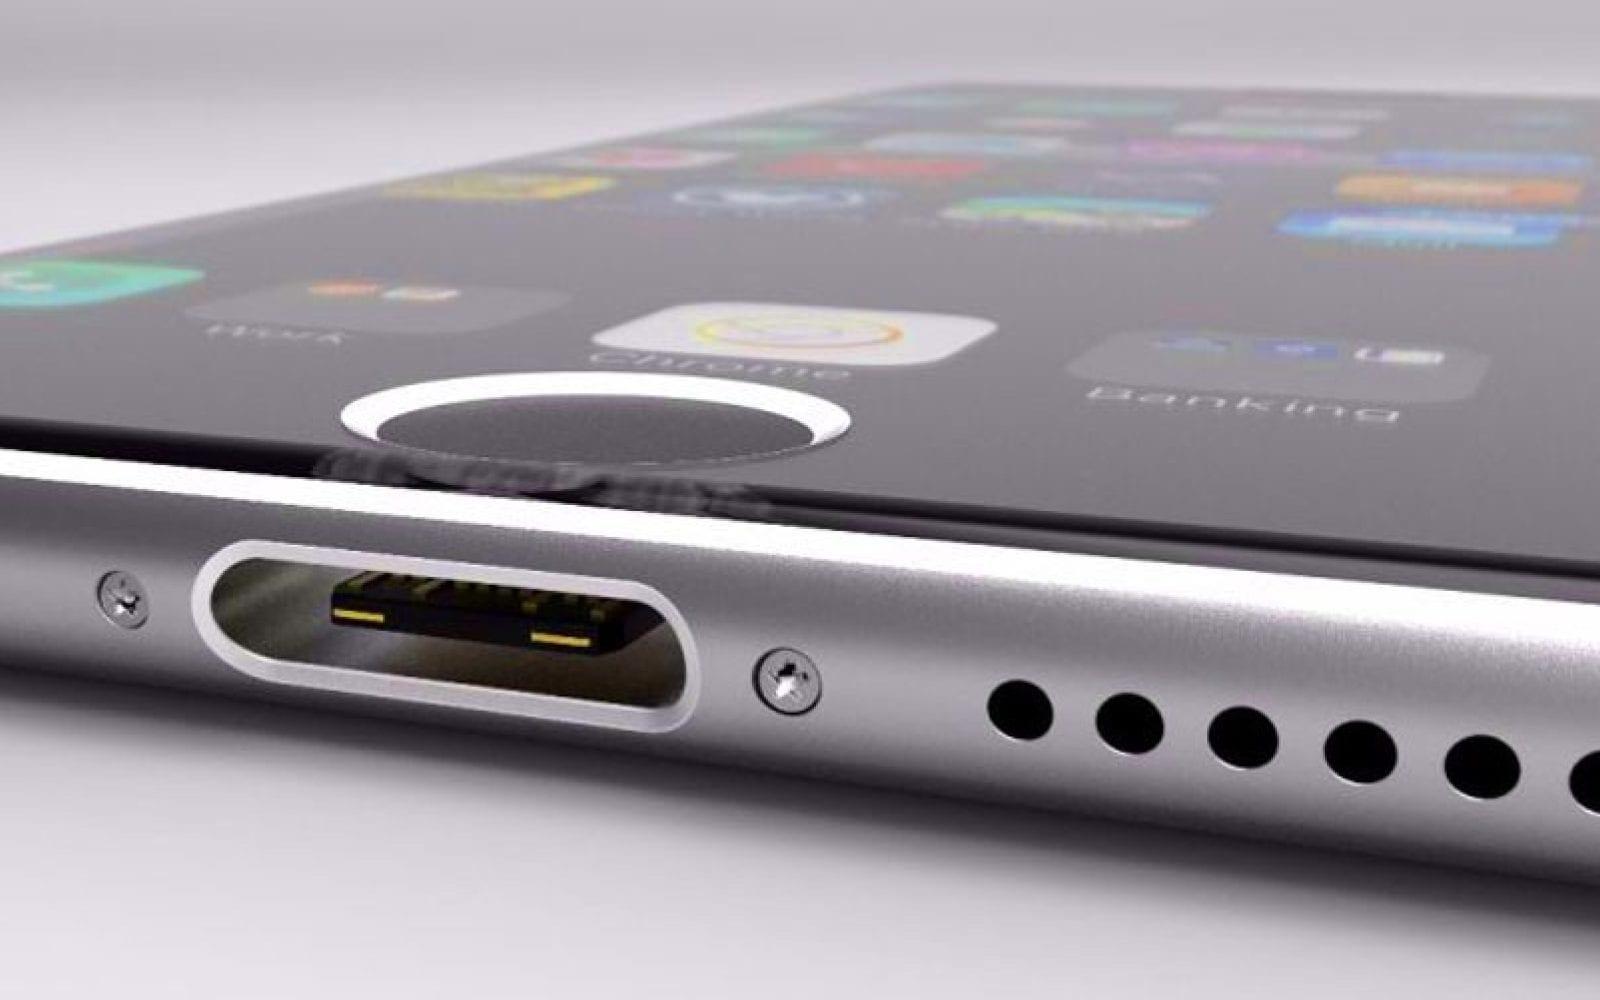 iPhone 12: niente USB-C, la porta Lightning resiste (rumor)